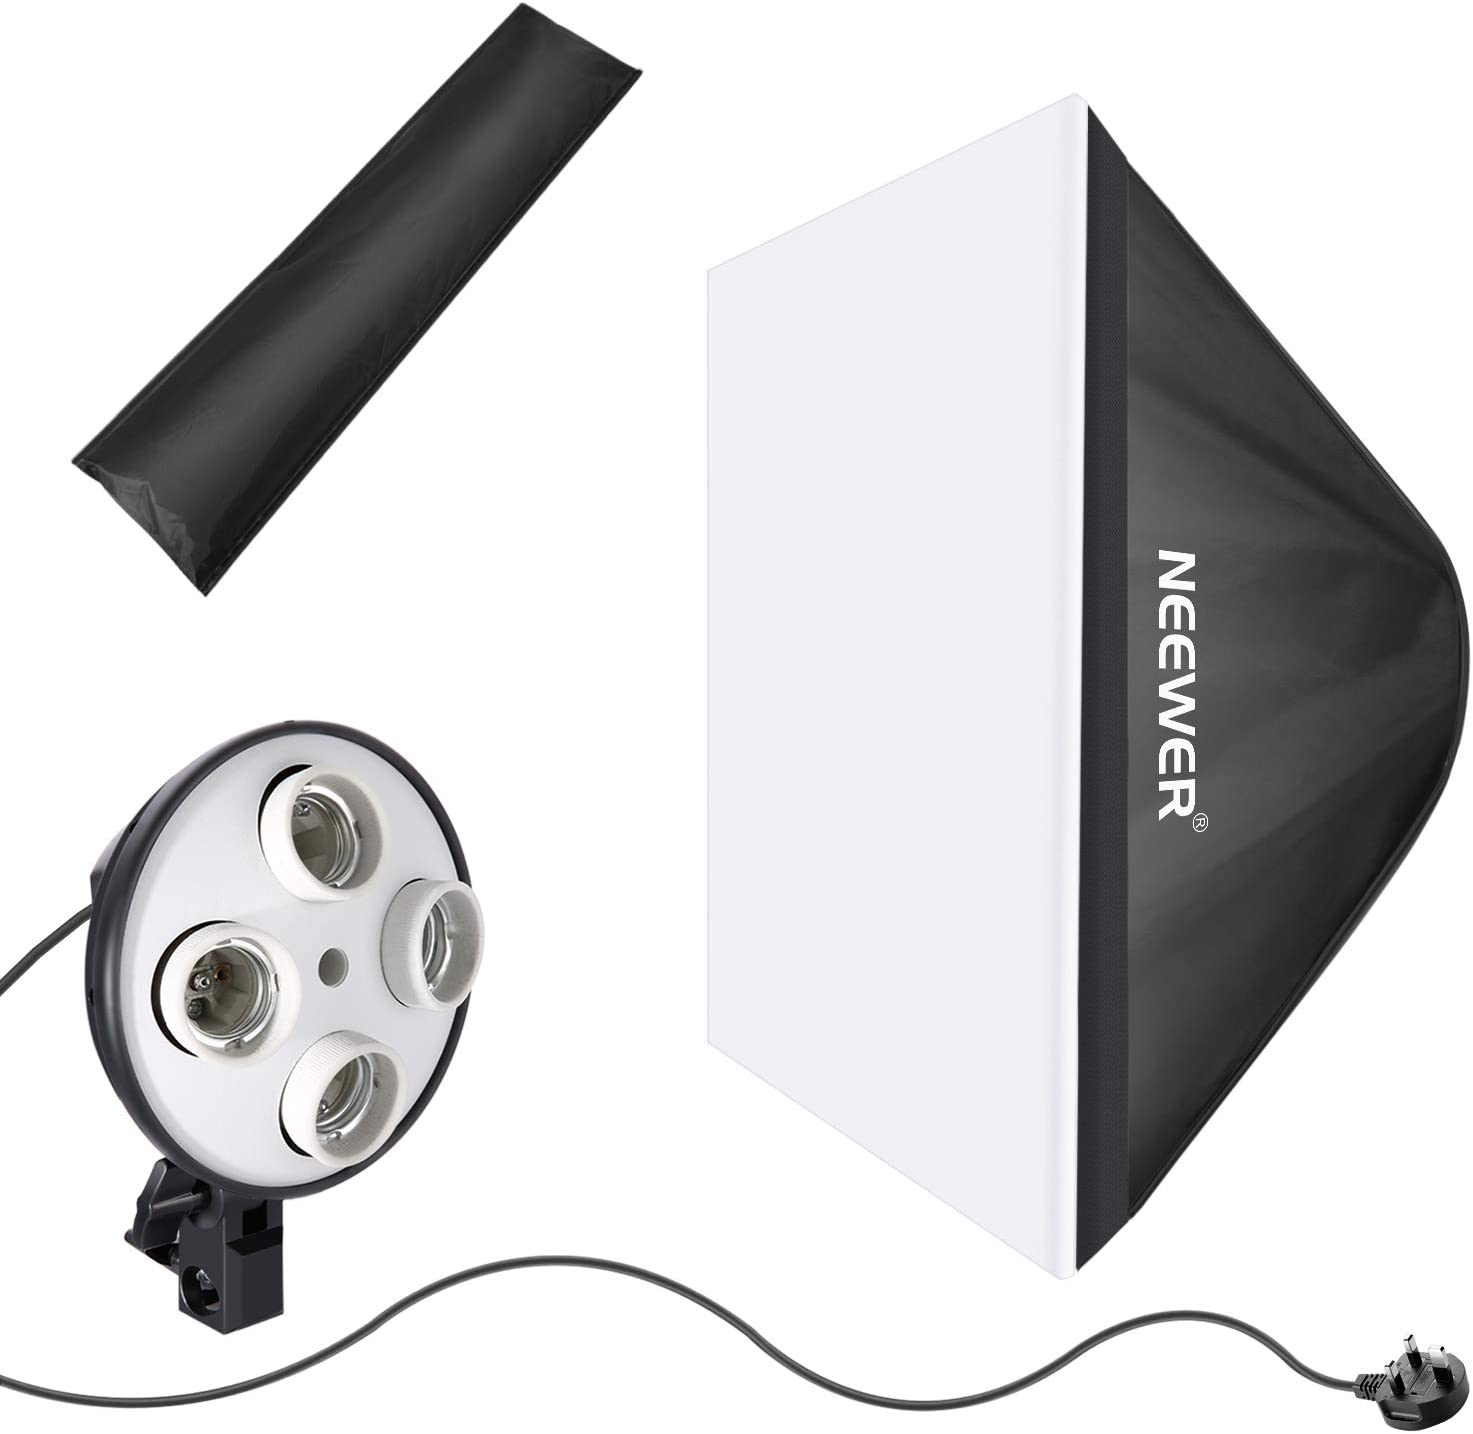 Photography Studio Light Reflector Softbox Adaptor Light Tent 20x28 Softbox with 4 Socket